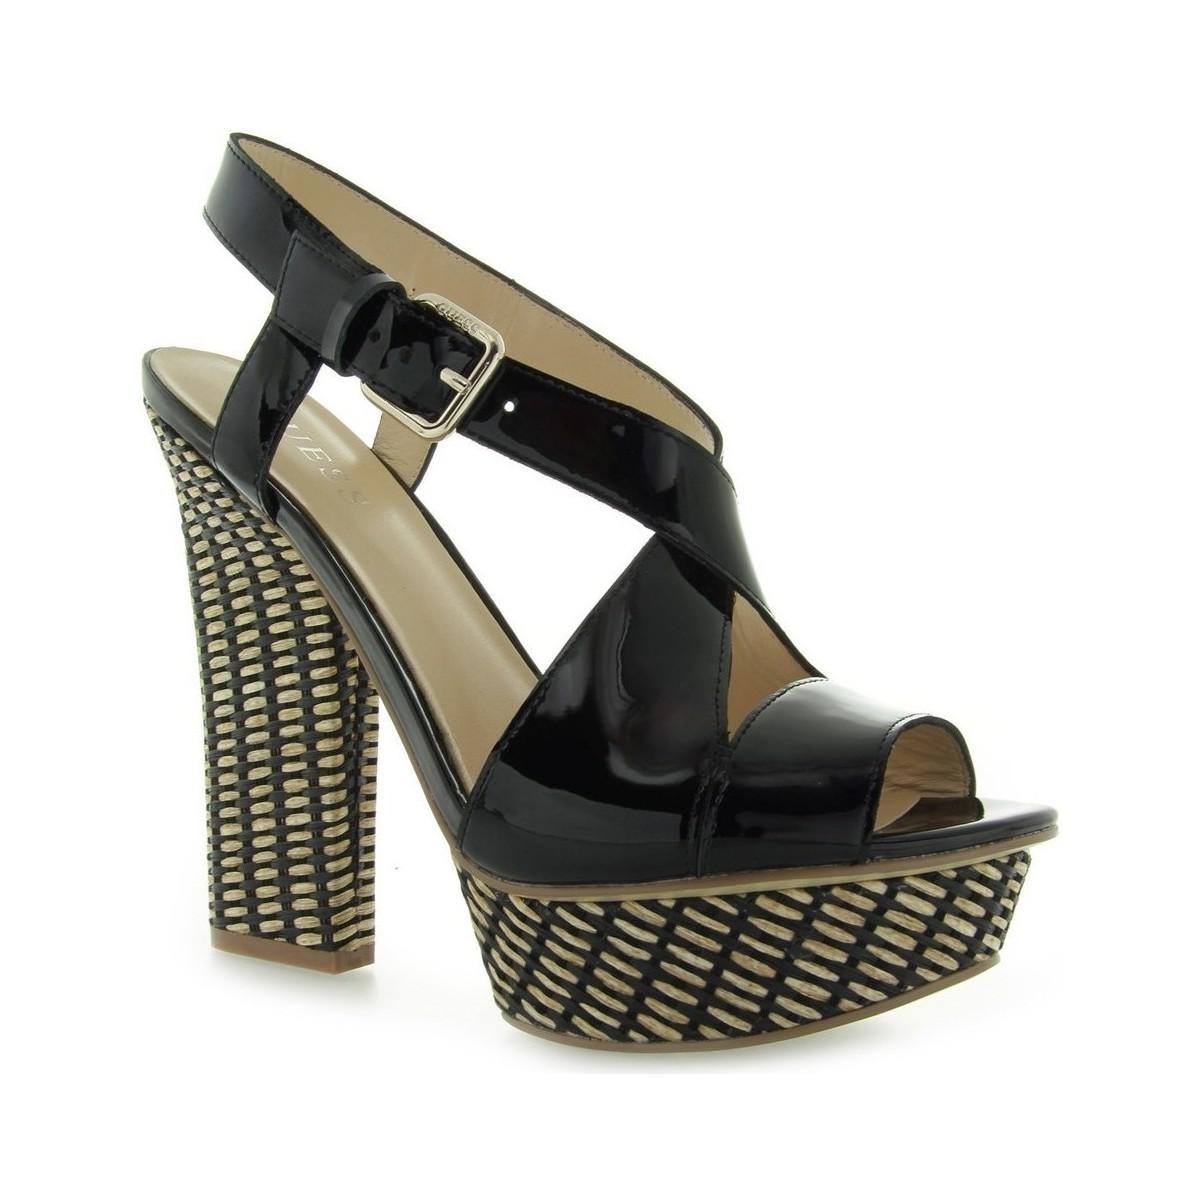 47e14d18ec3 Guess Jolani Sandalo Sandal Patent Black Women s Sandals In Black in ...